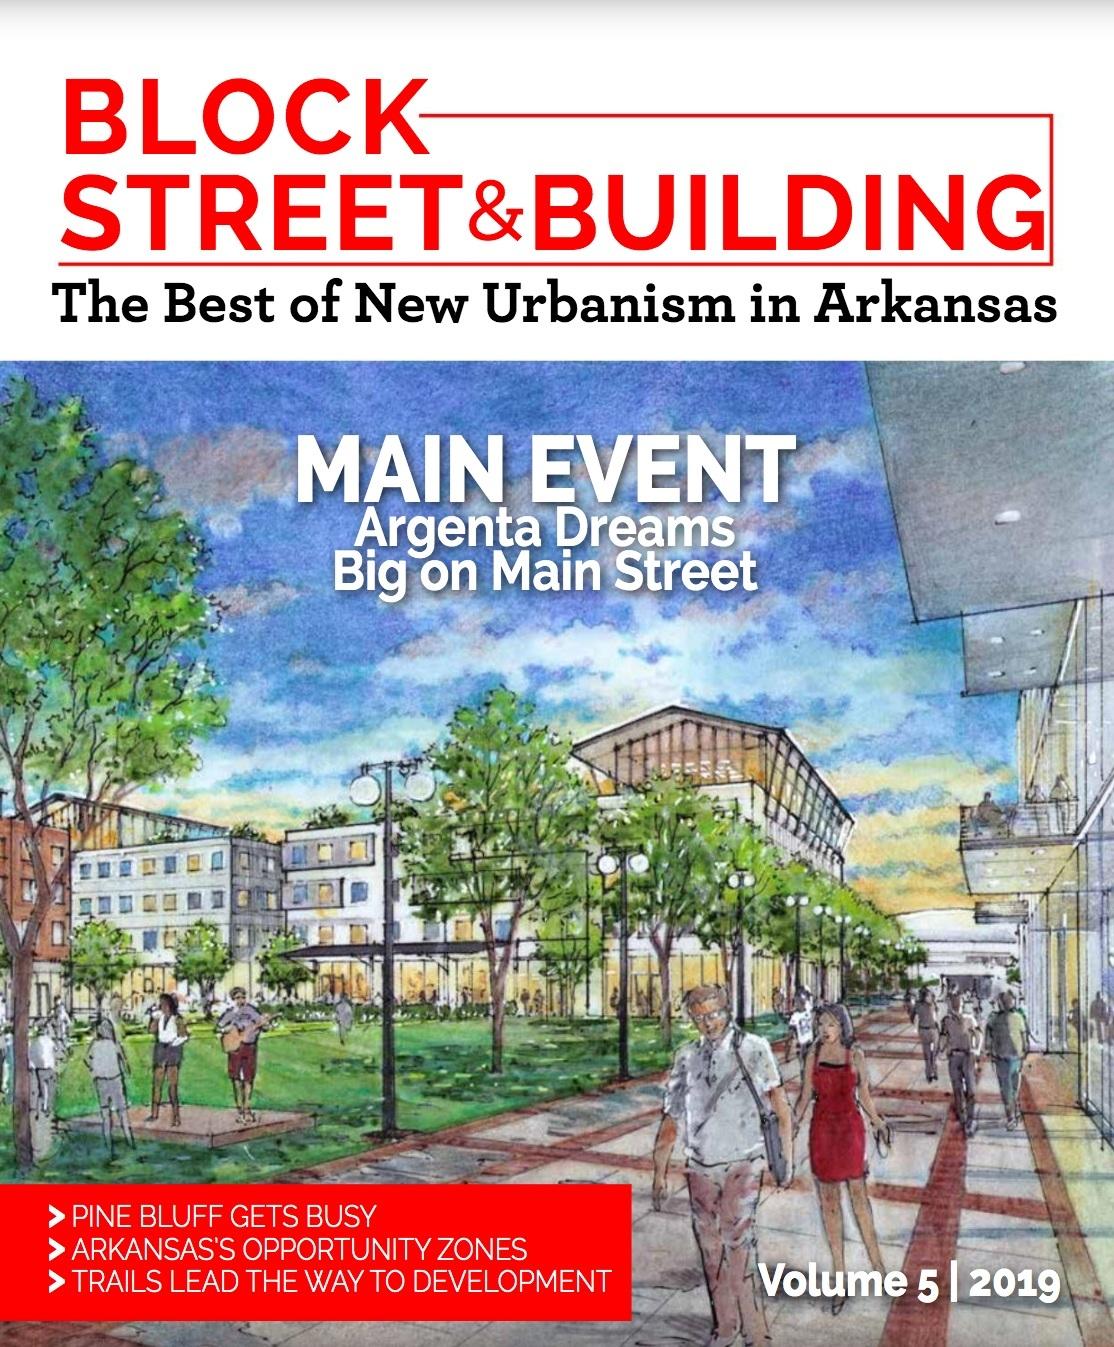 Block Street & Building 2019